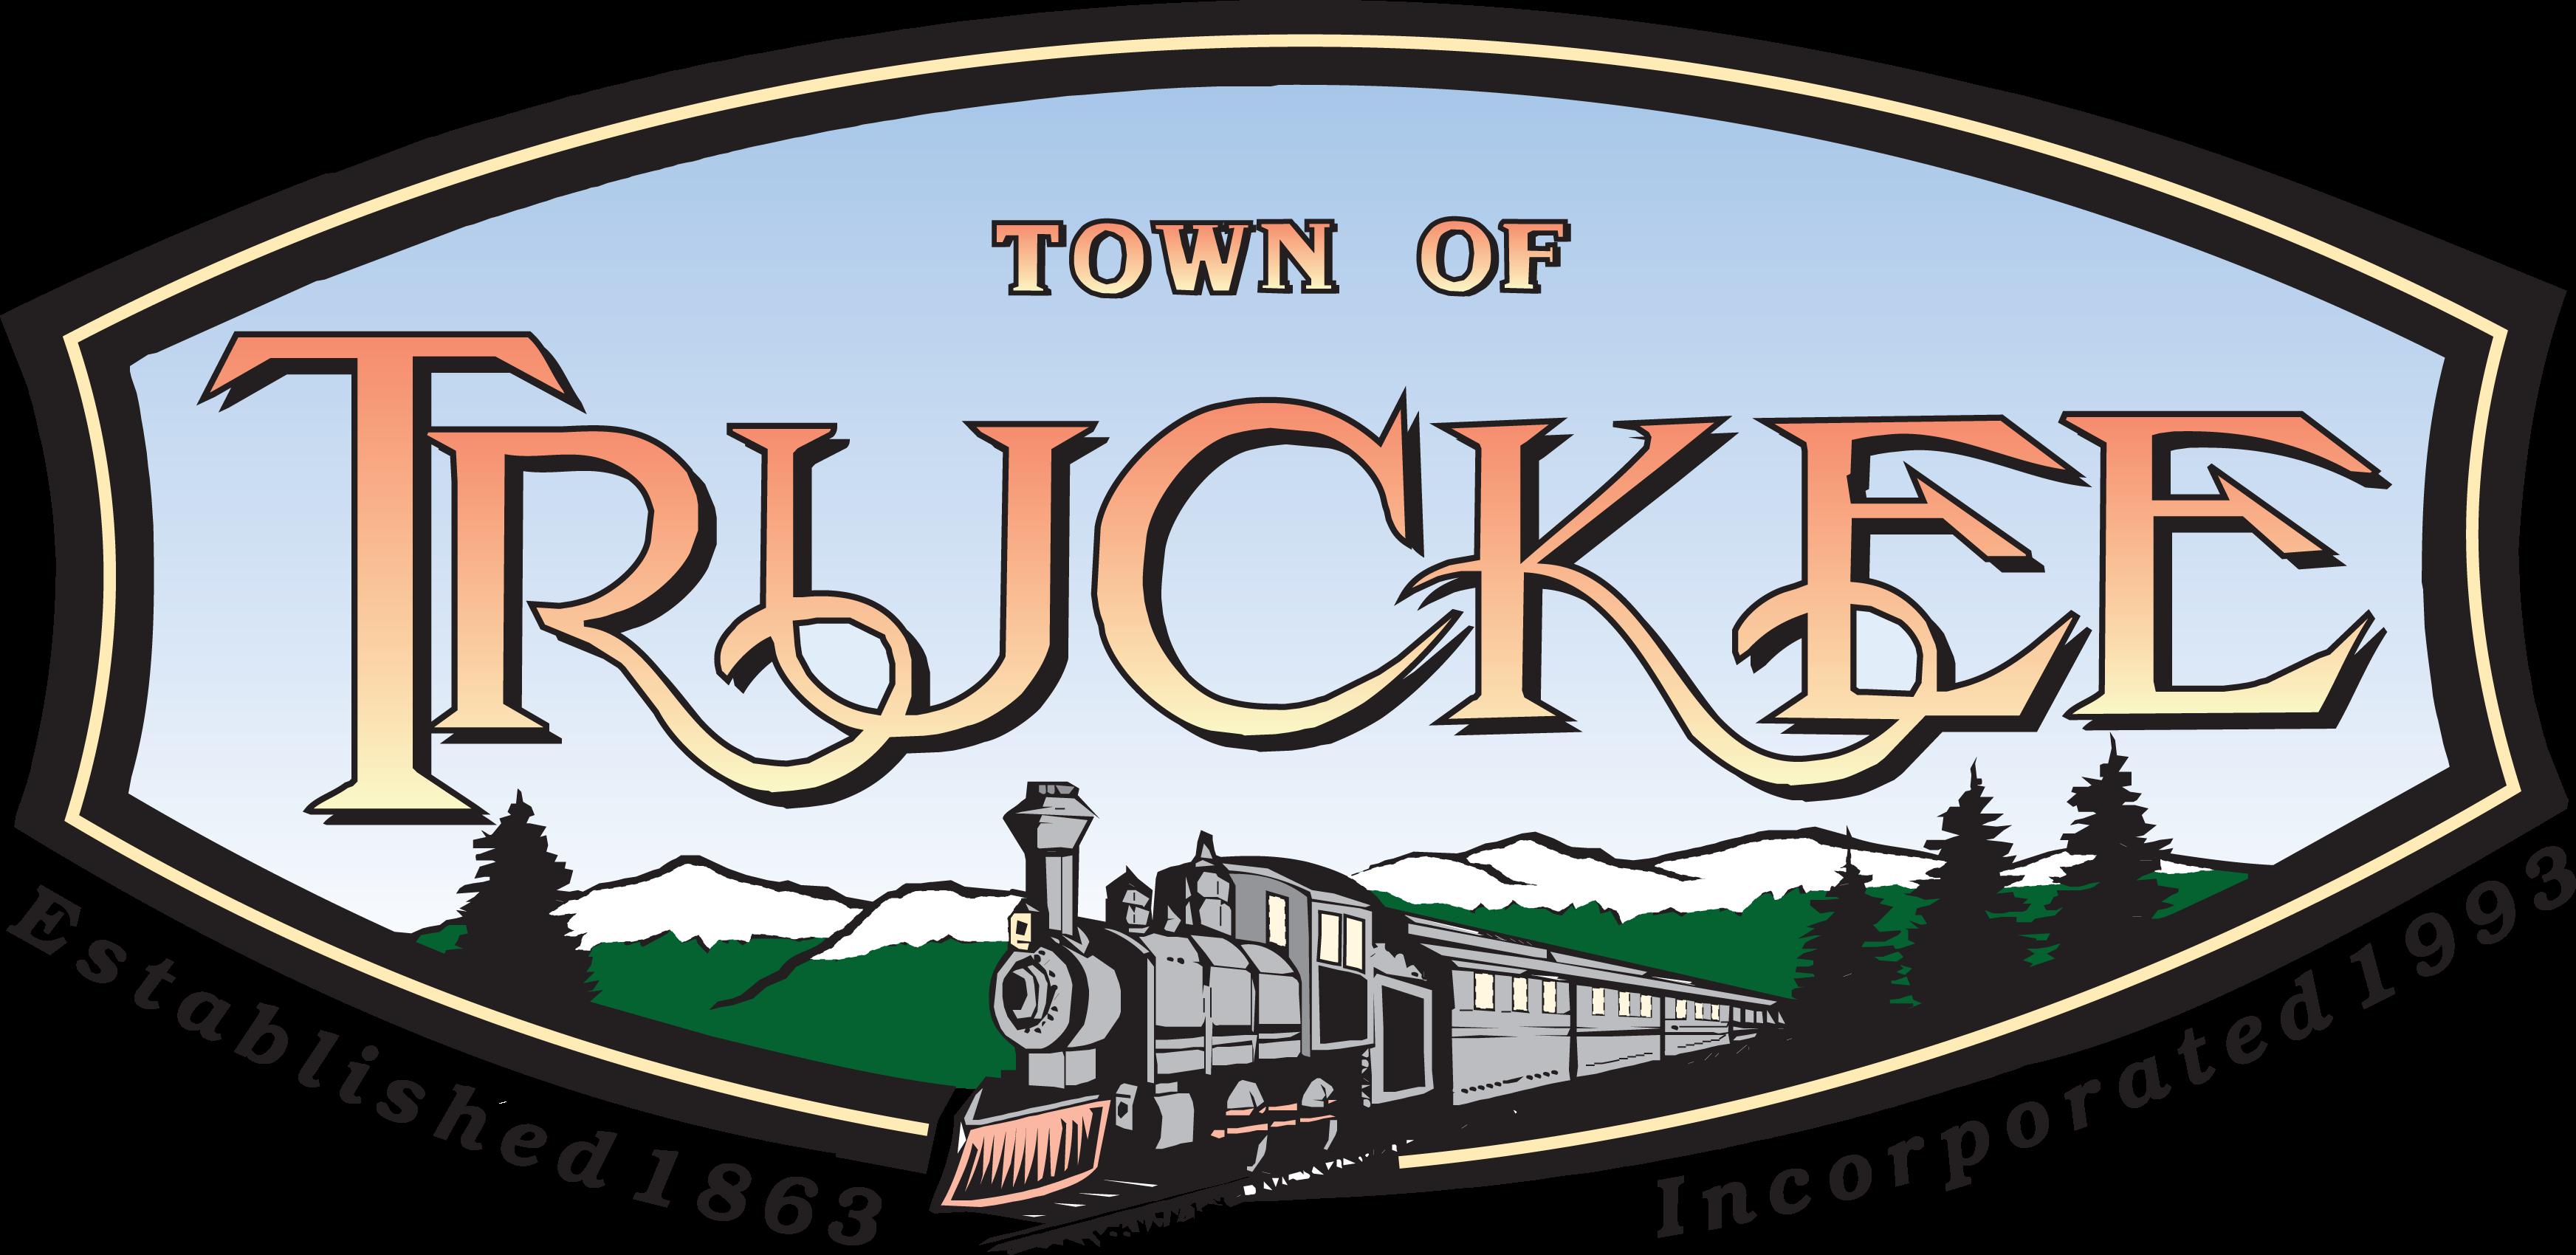 Town of Truckee logo